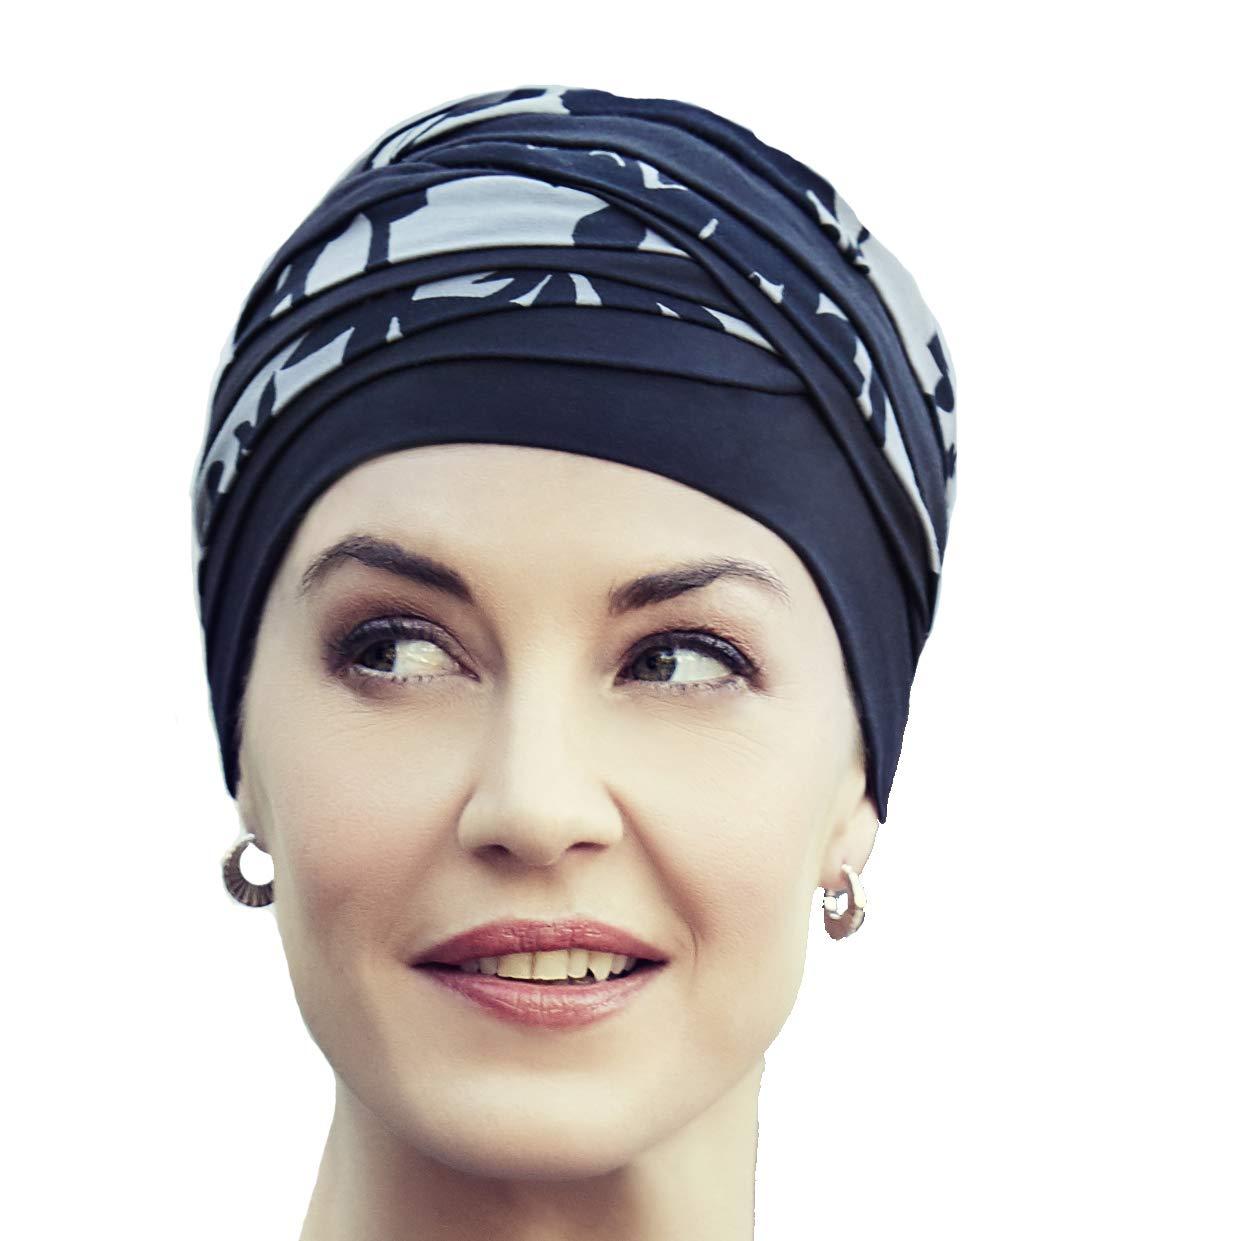 Christine Headwear Shantia Bamboo Turban Stoffturban Kopftuch Chemo-Kopfbedeckung Chemomütze 1131-0395